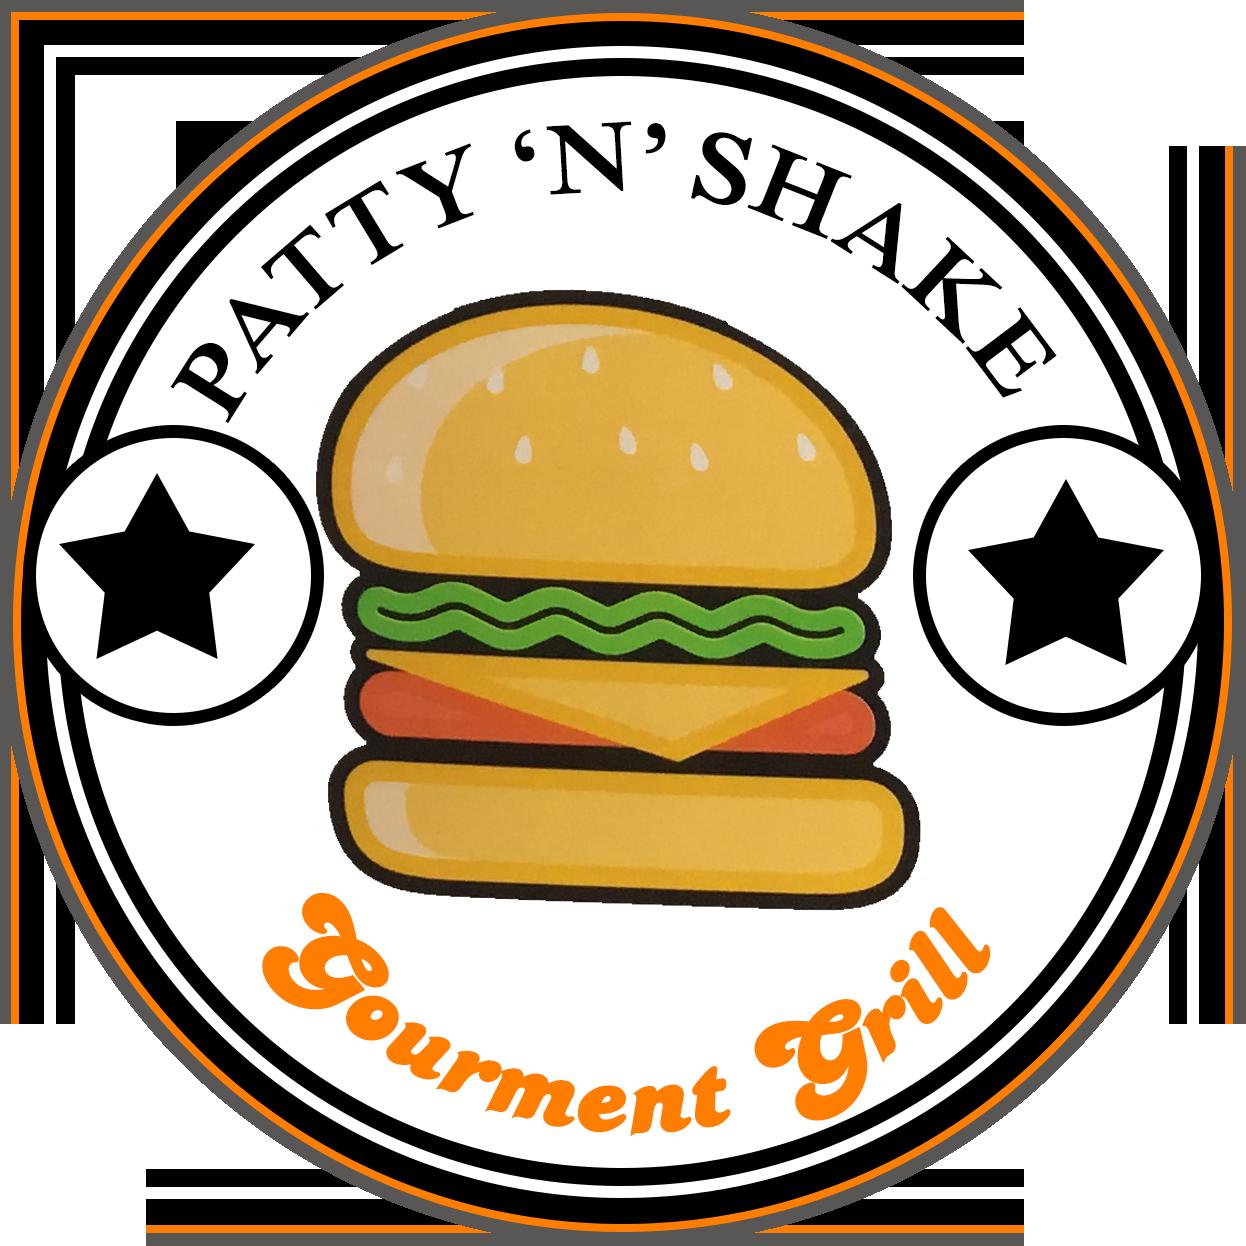 Hamburger clipart takeaway food. Patty n shake newcastle